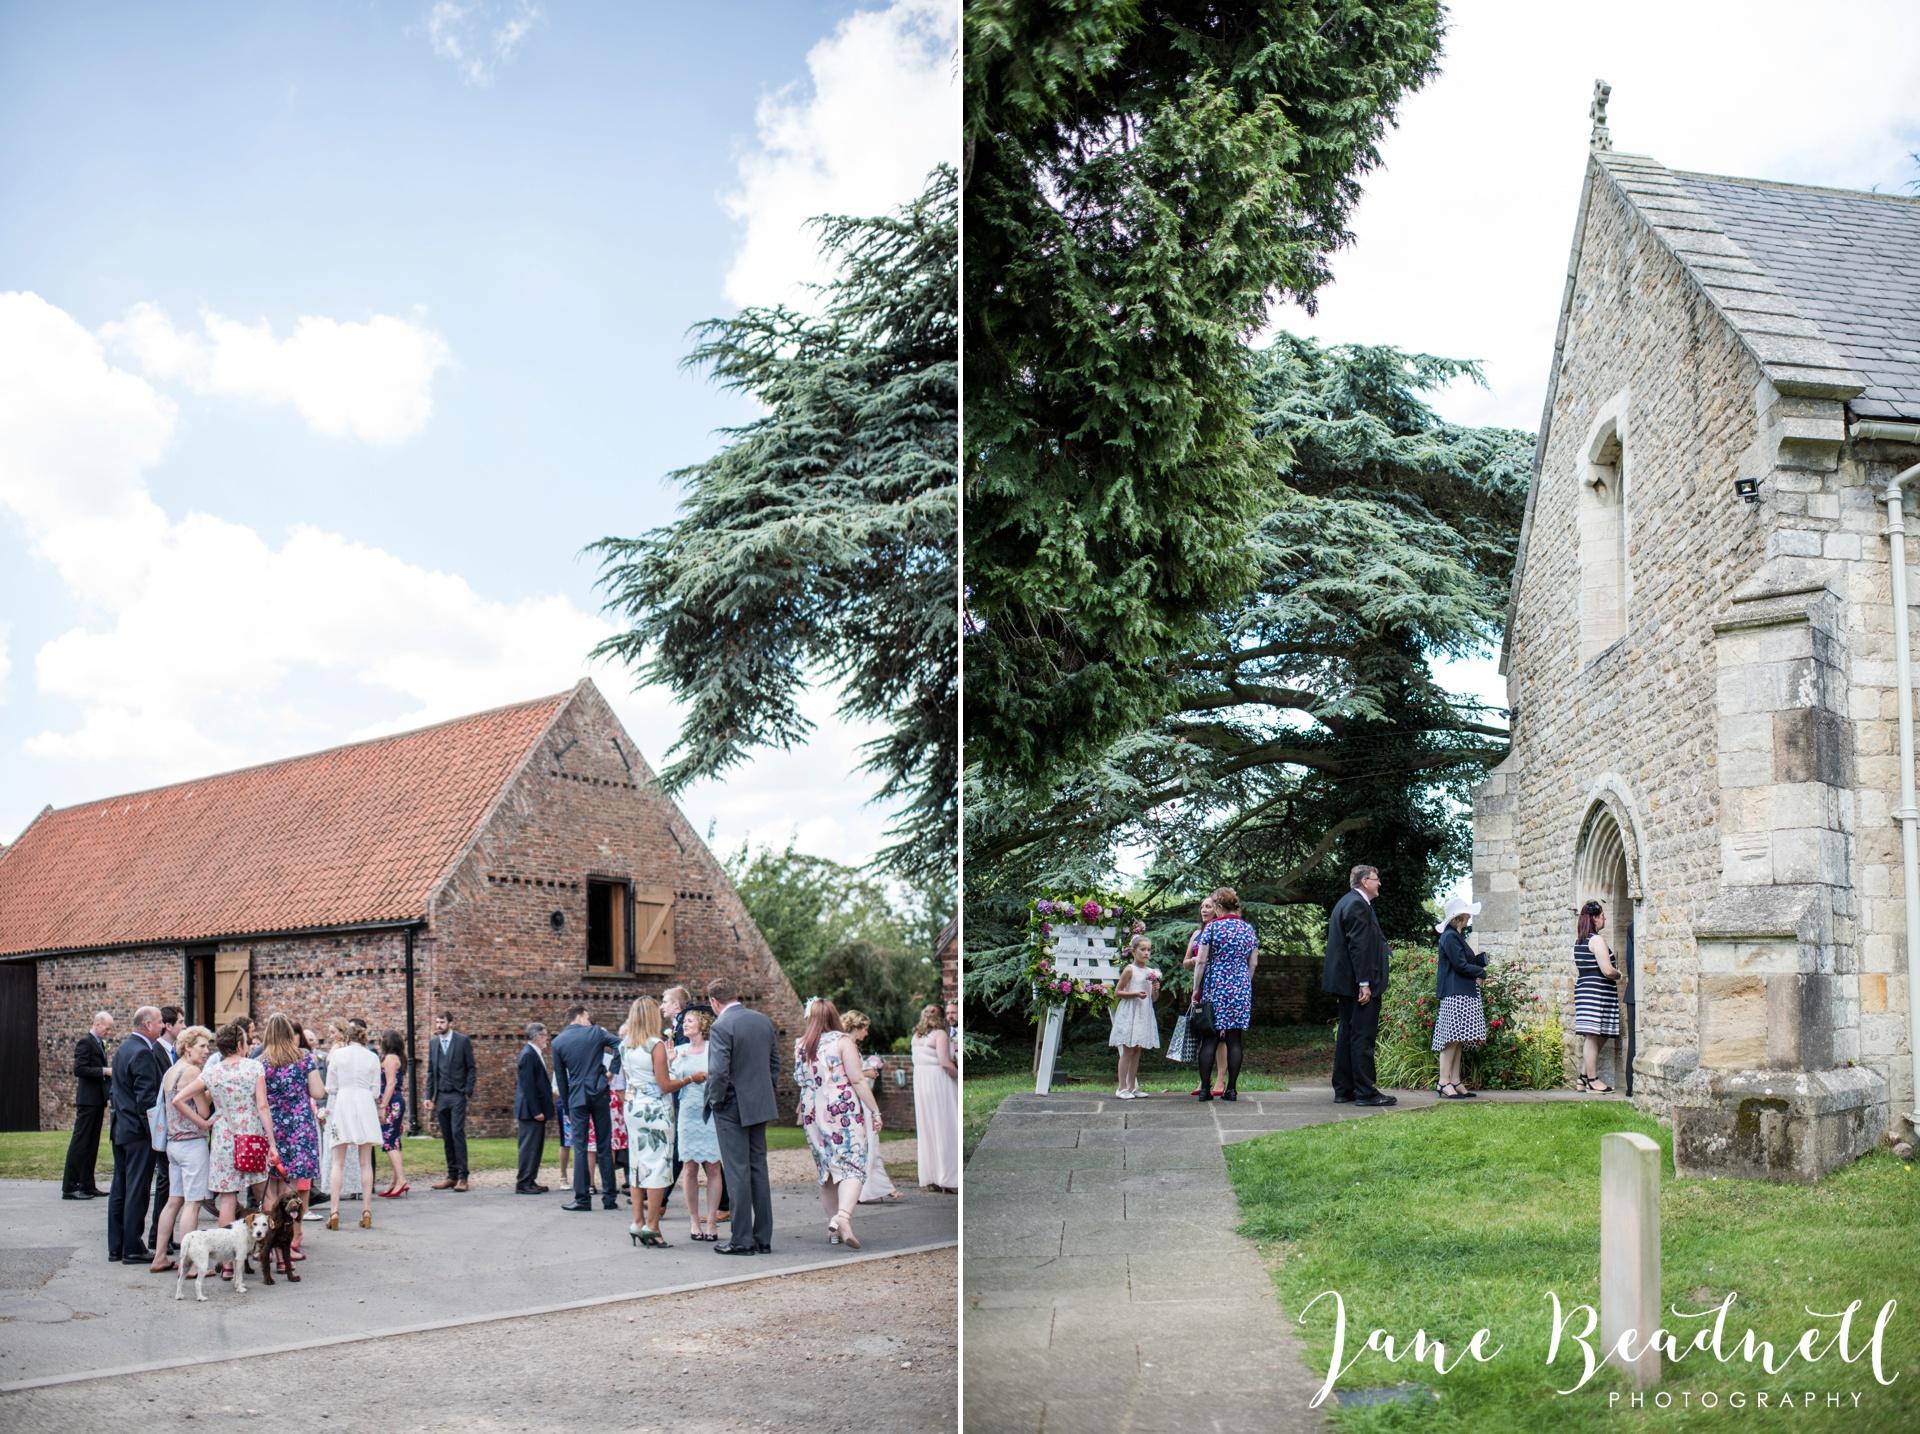 yorkshire-fine-art-wedding-photographer-jane-beadnell-photography-poppleton-york_0028